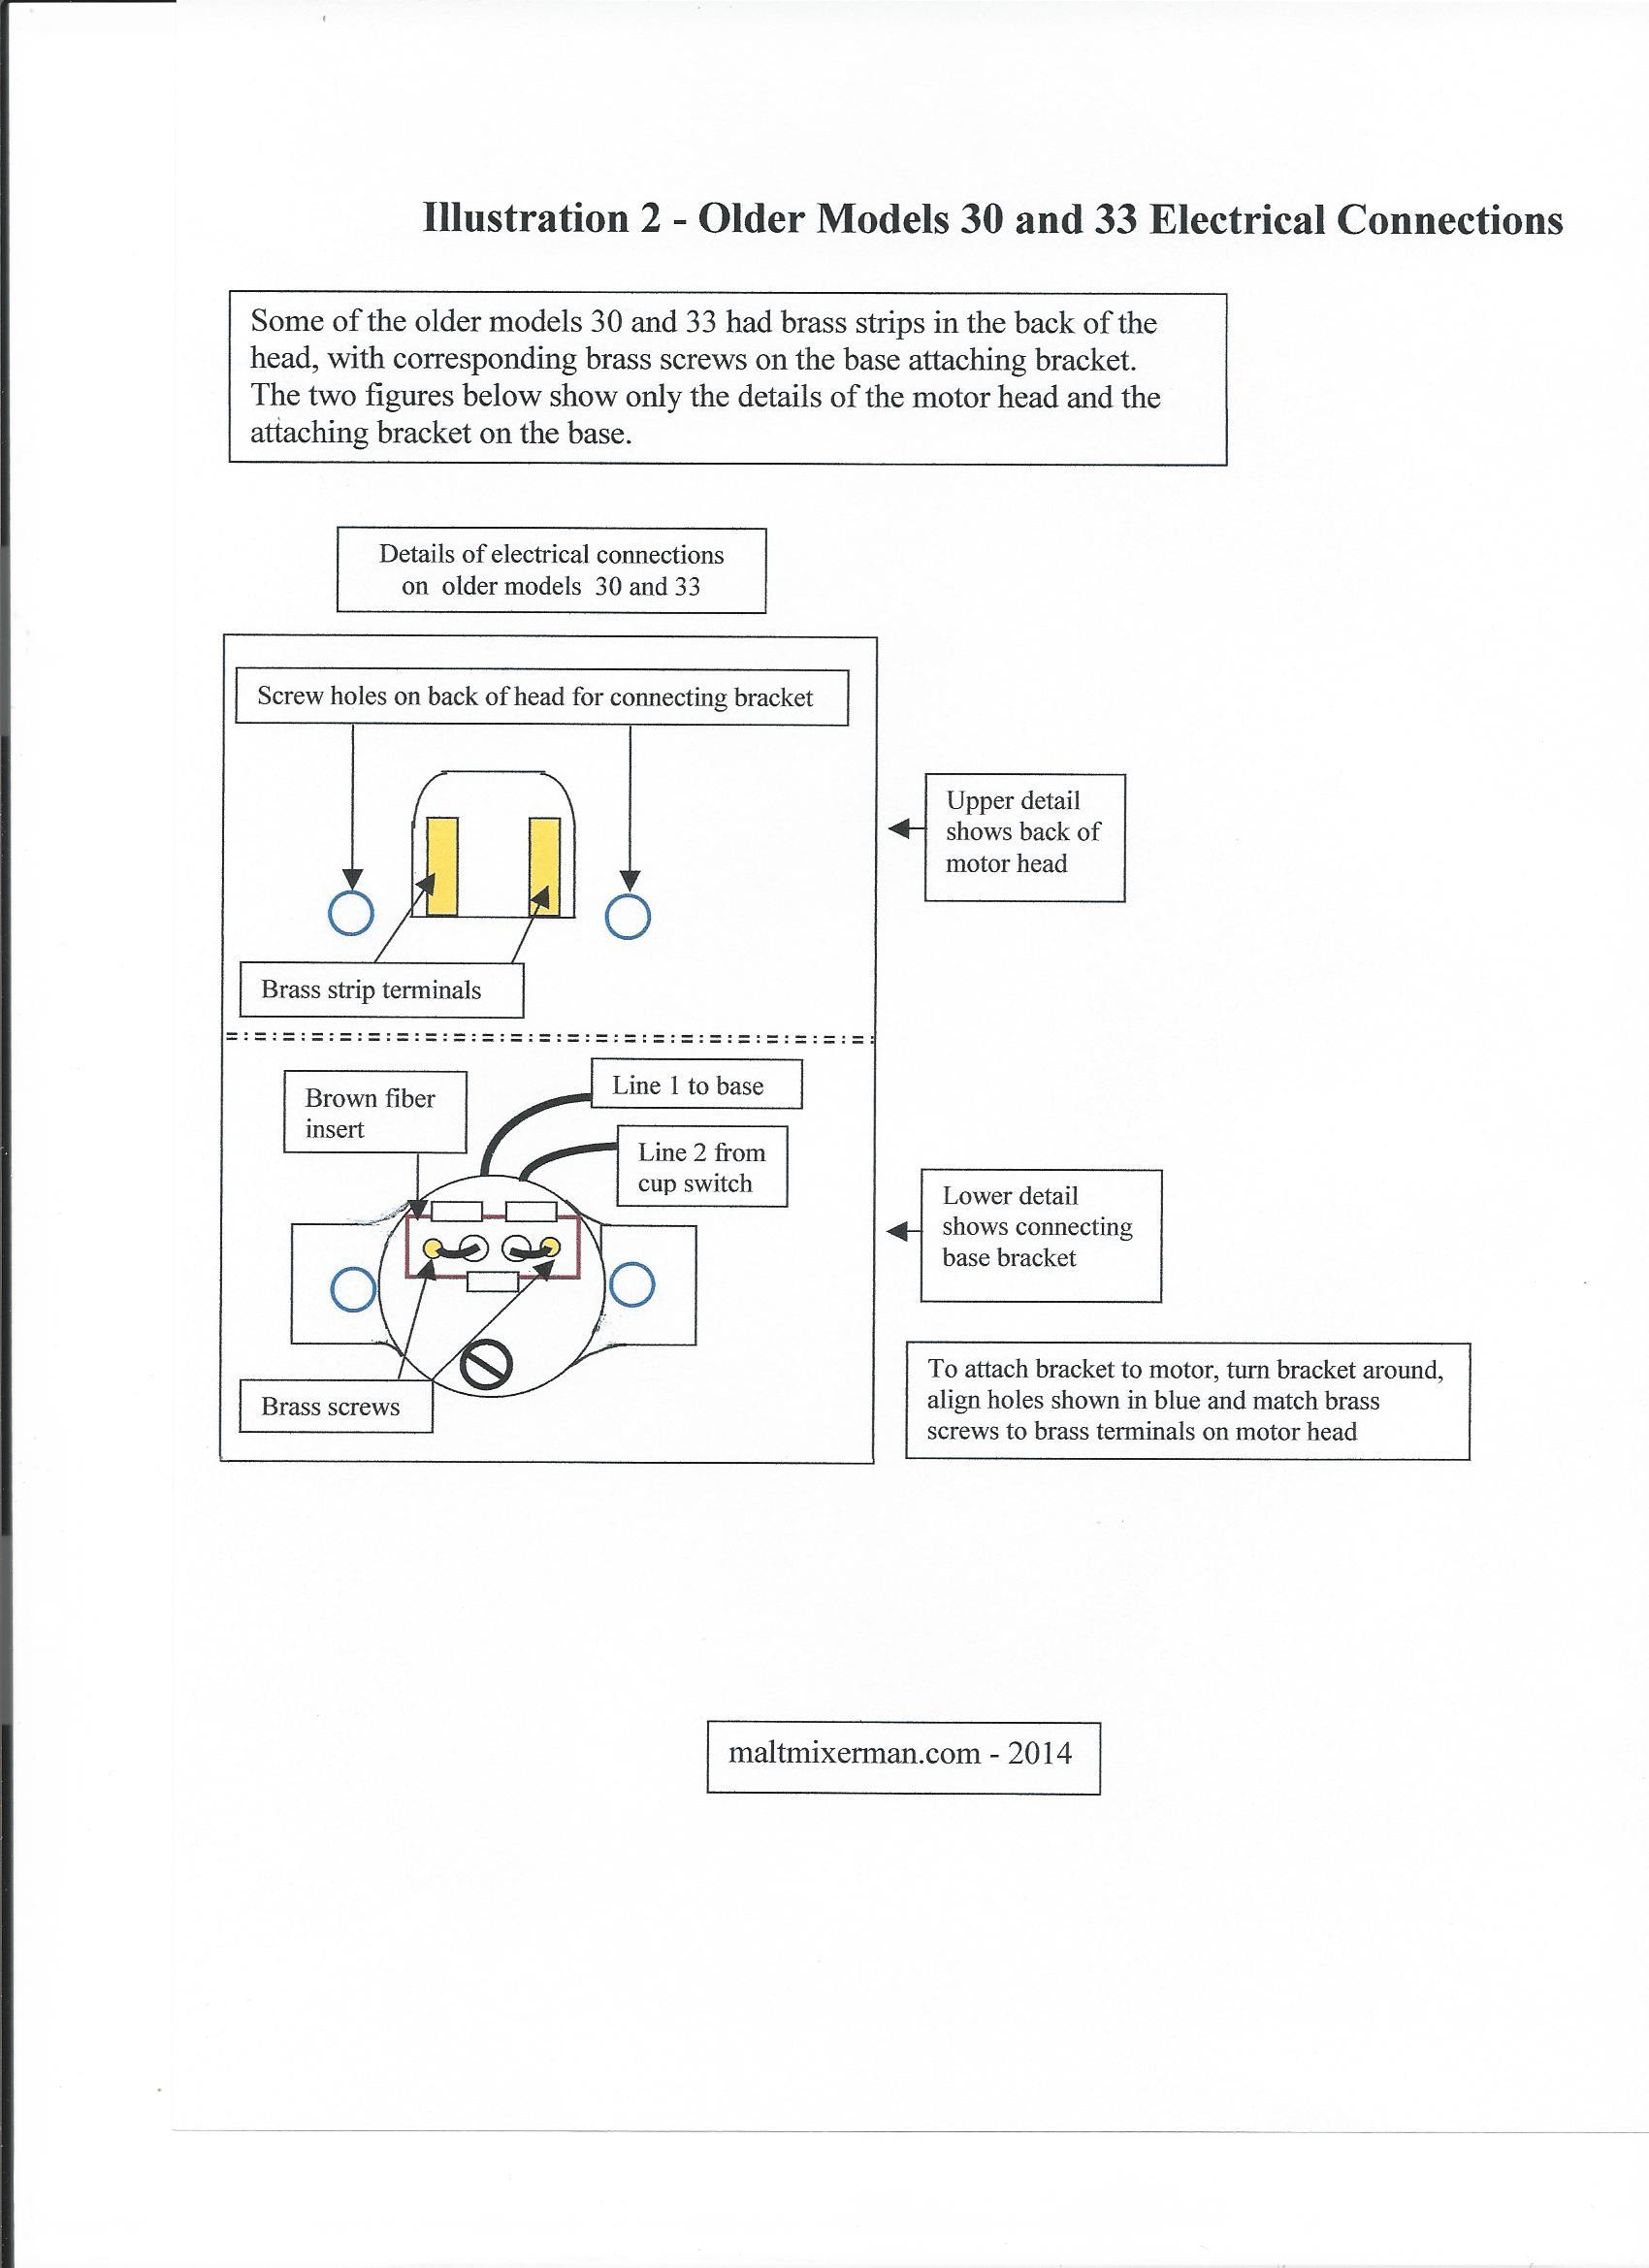 Hamilton Beach Malt Mixer Repair & Service on powered mixer diagrams, mixer circuit schematic, mixer parts, xbox 360 cable connections diagrams, pro tools studio diagrams, home theater system connection diagrams, sewage pump venting diagrams, audio connector diagrams,